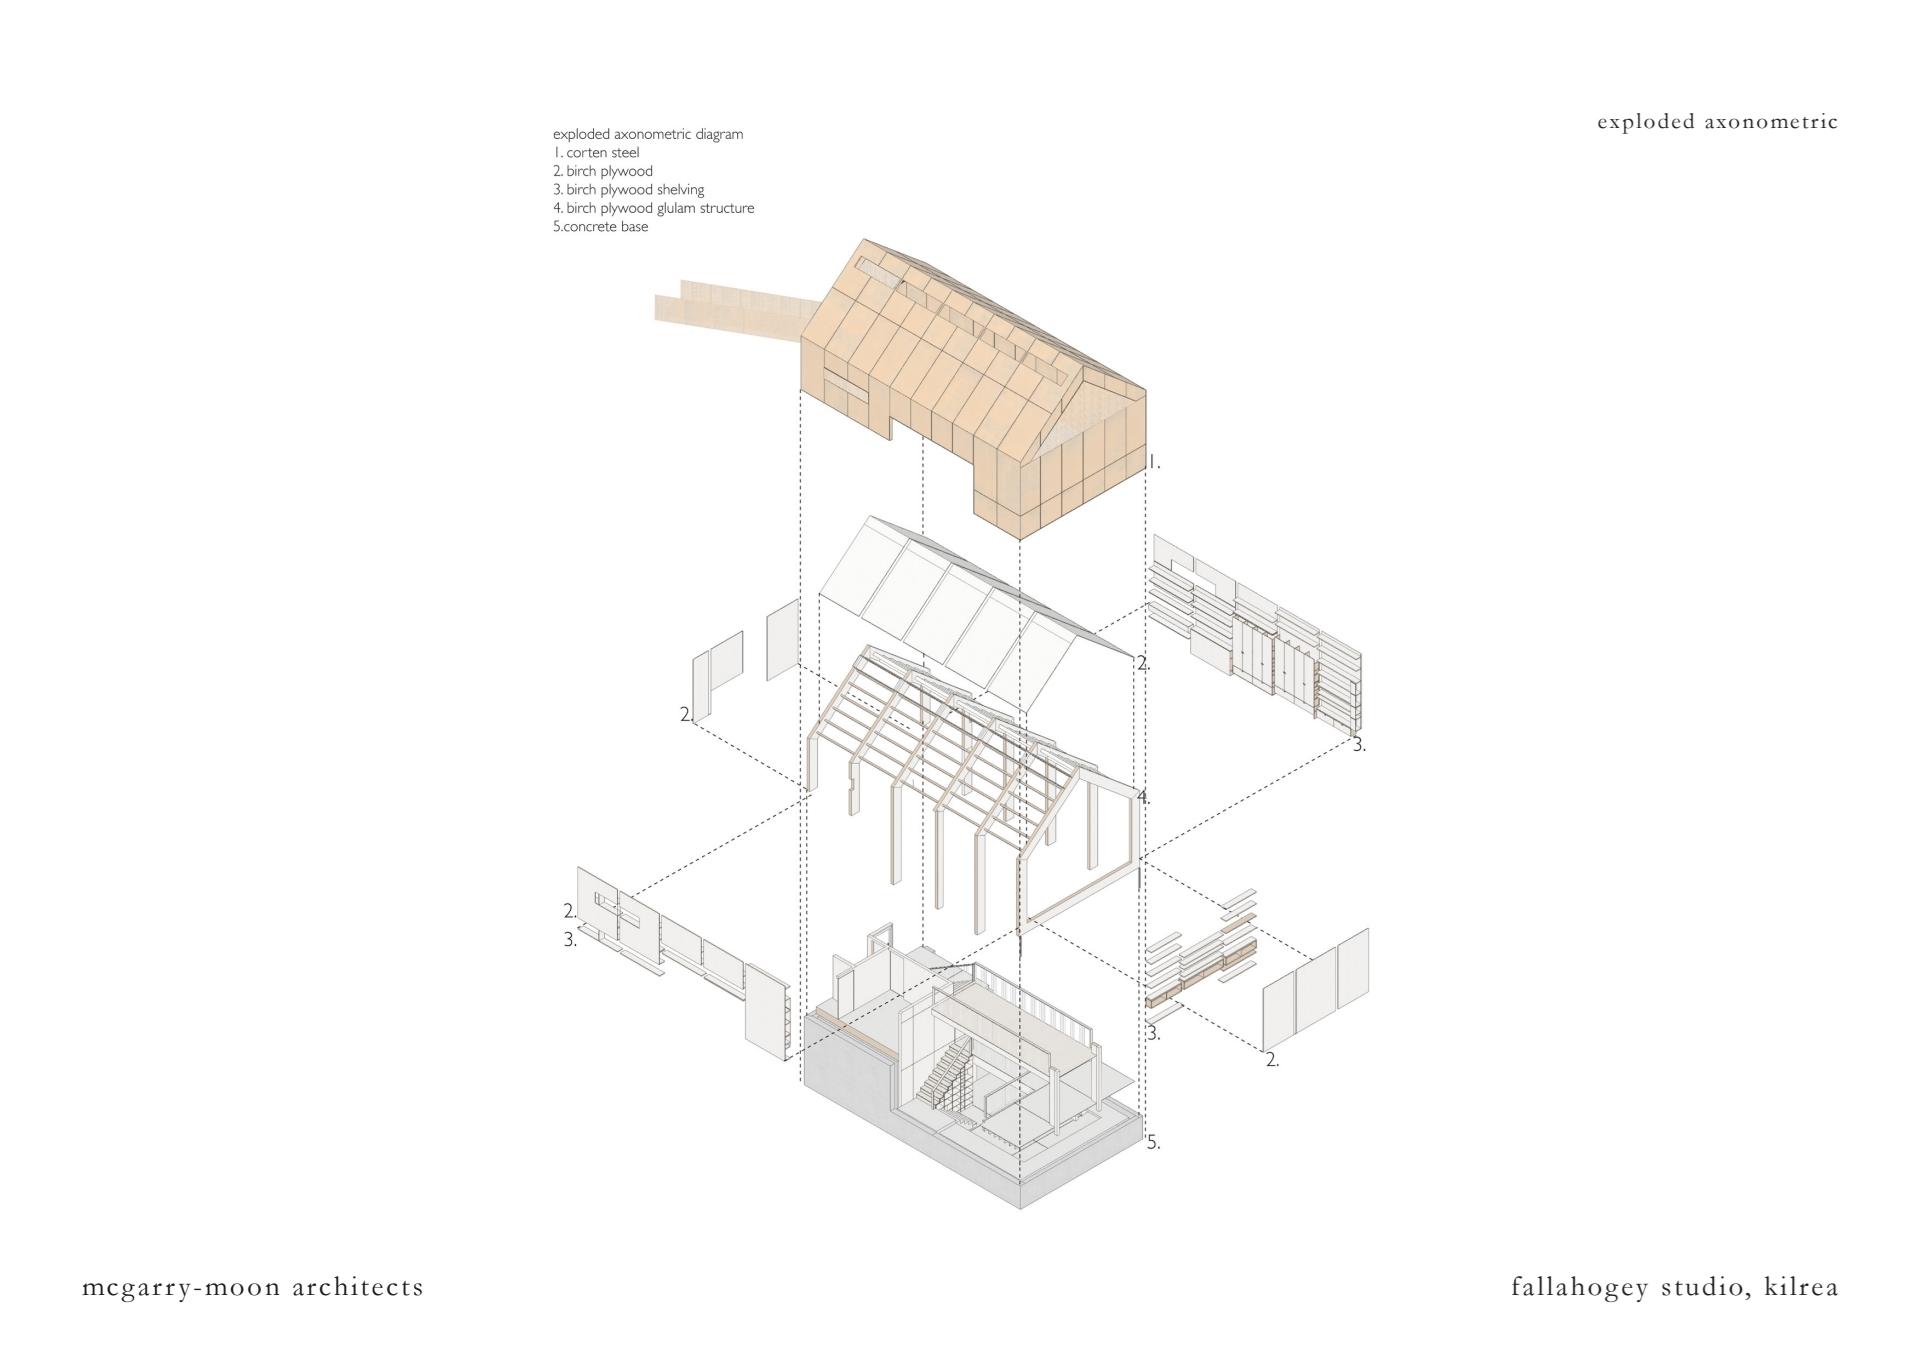 Fallahogeystudio1527mcgarrymoonarchitectsltd6jpggh1358w1920laenhash4d5990258ccc2ae3c5d0f549f37da9c9cece46a6 mcgarry moon architects pooptronica Choice Image